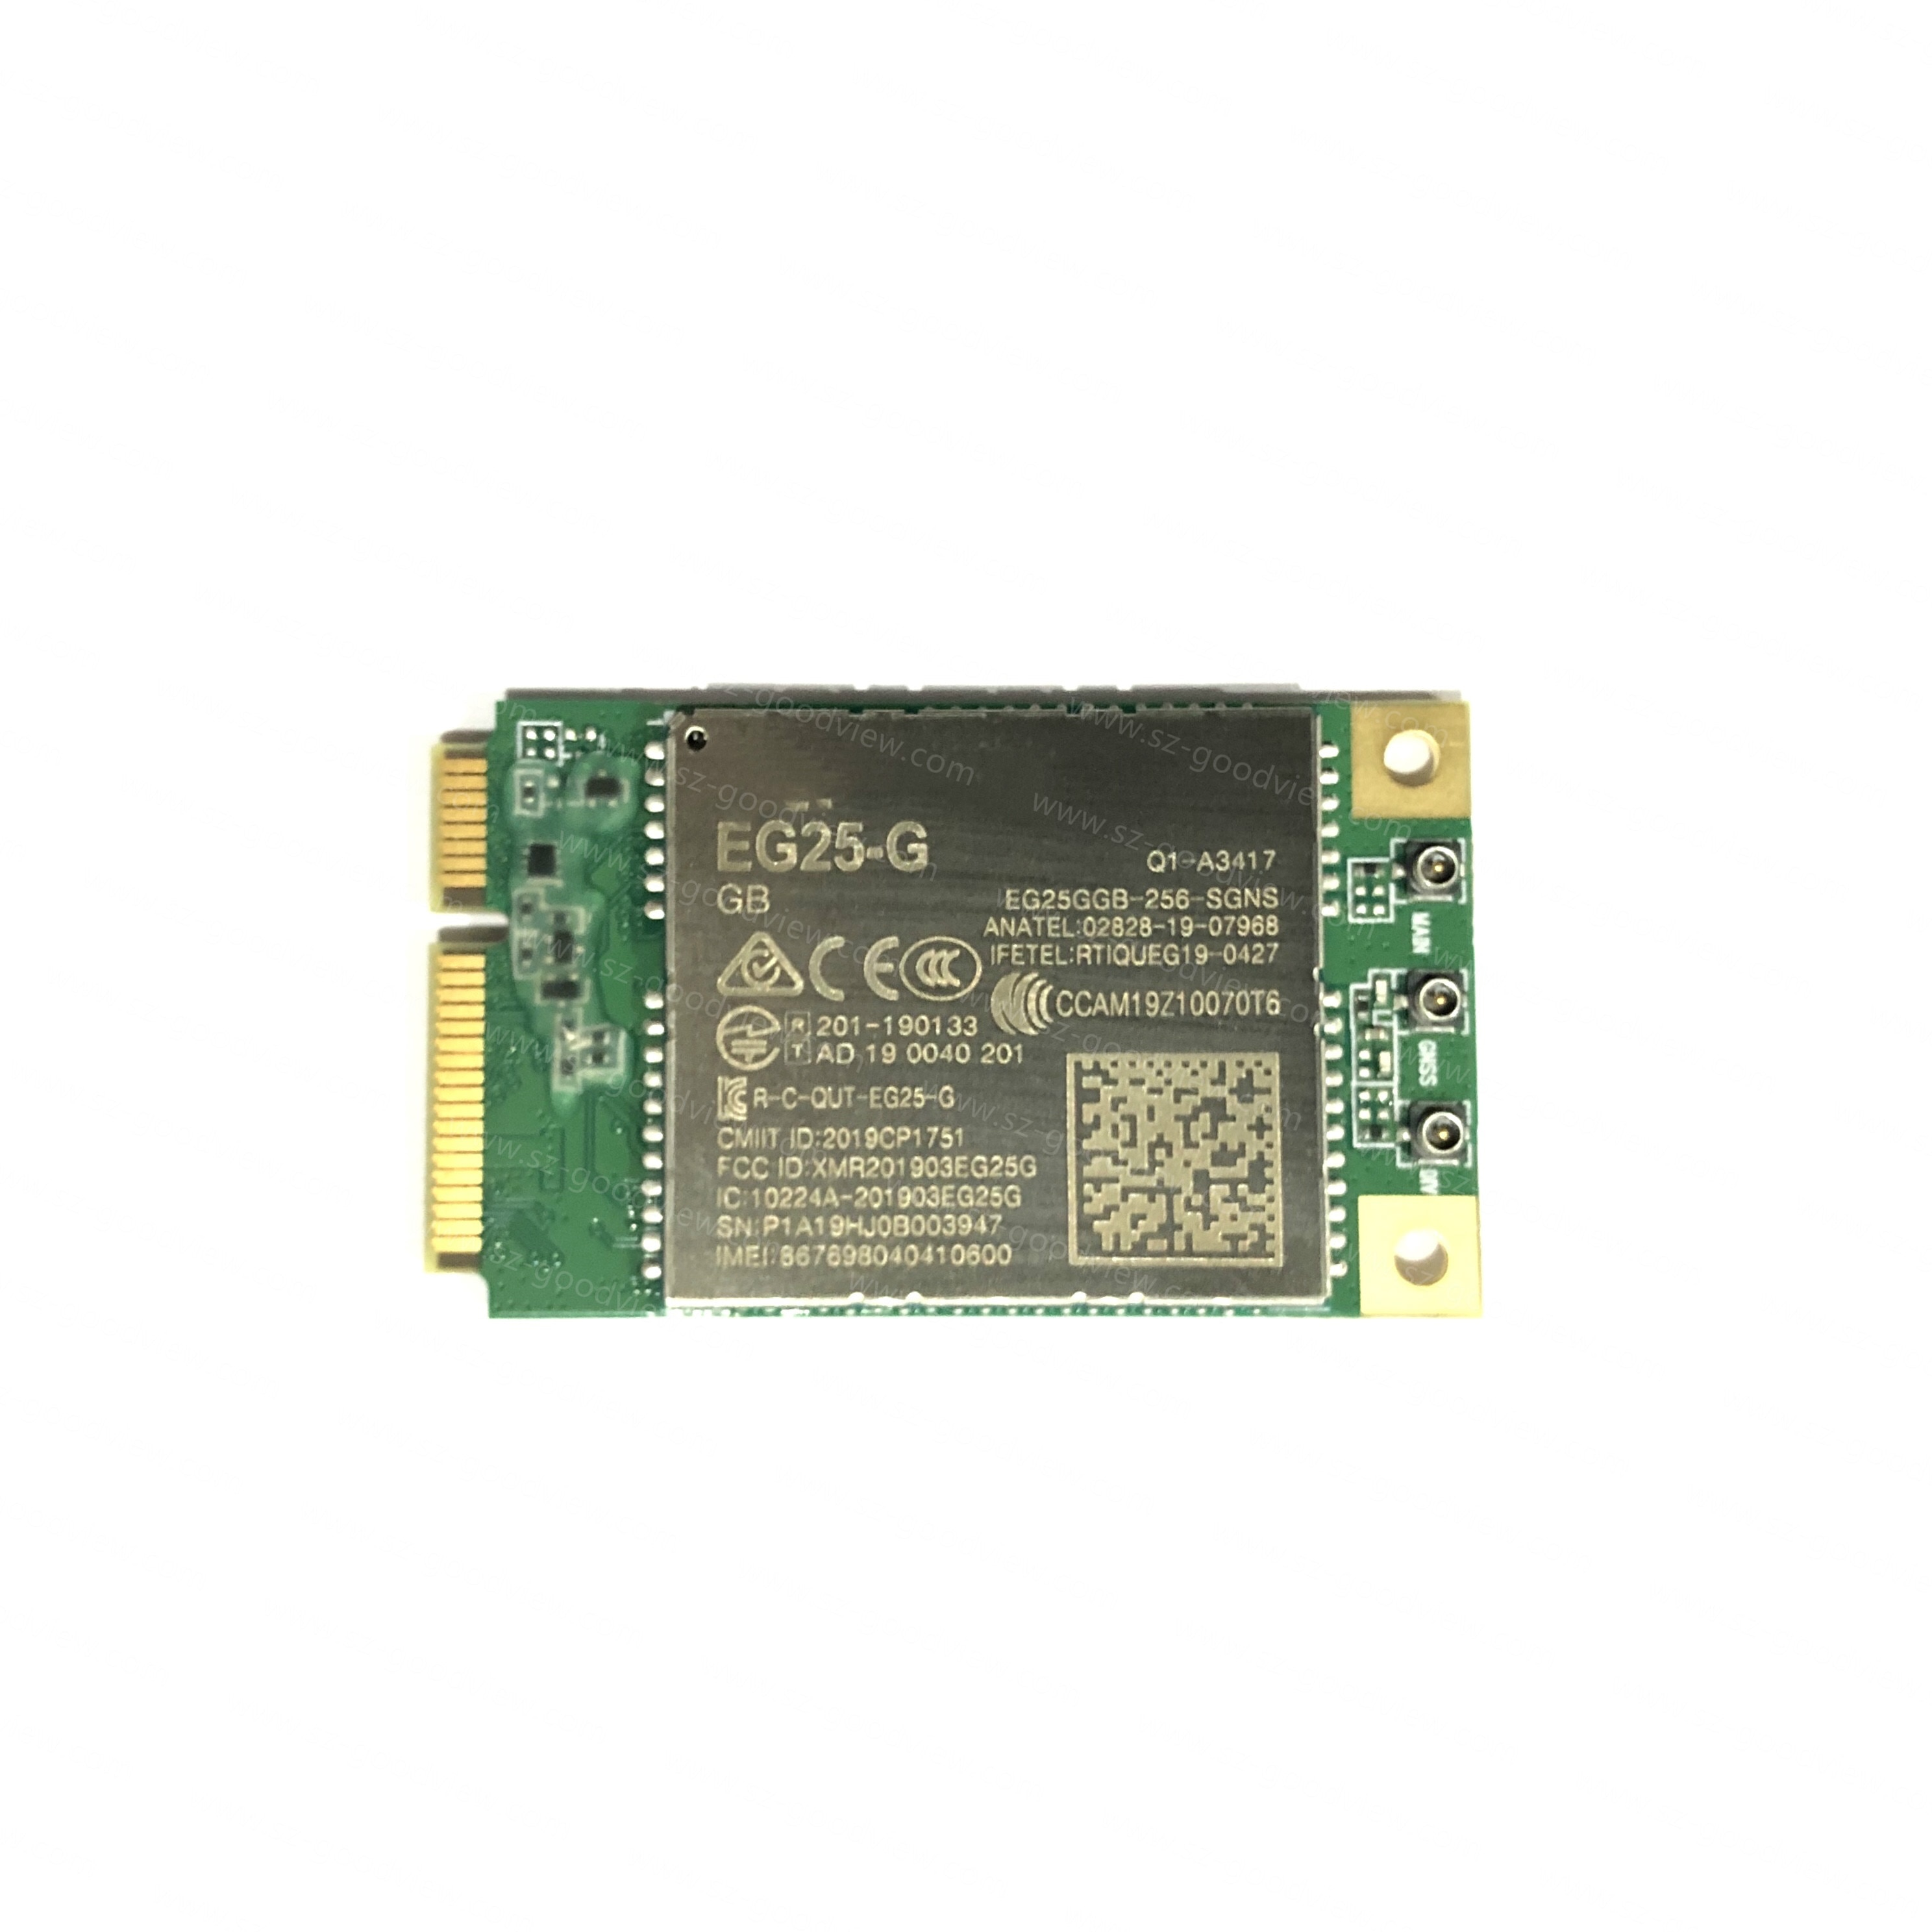 4G Lte Cat4 EG25-G Pcie Development Board Zonder Sim-kaart Houder enlarge